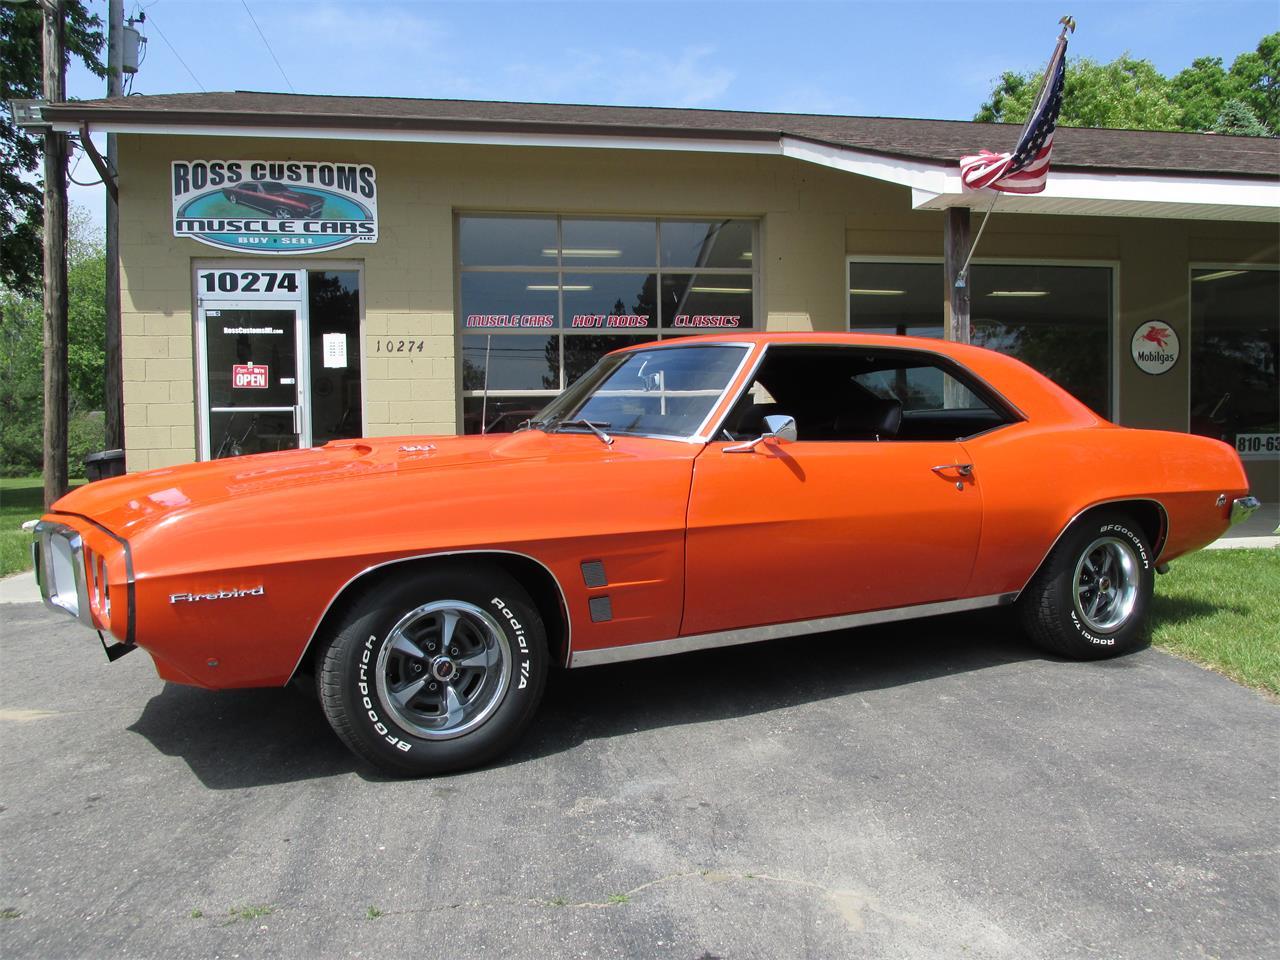 For Sale: 1969 Pontiac Firebird in Goodrich, Michigan